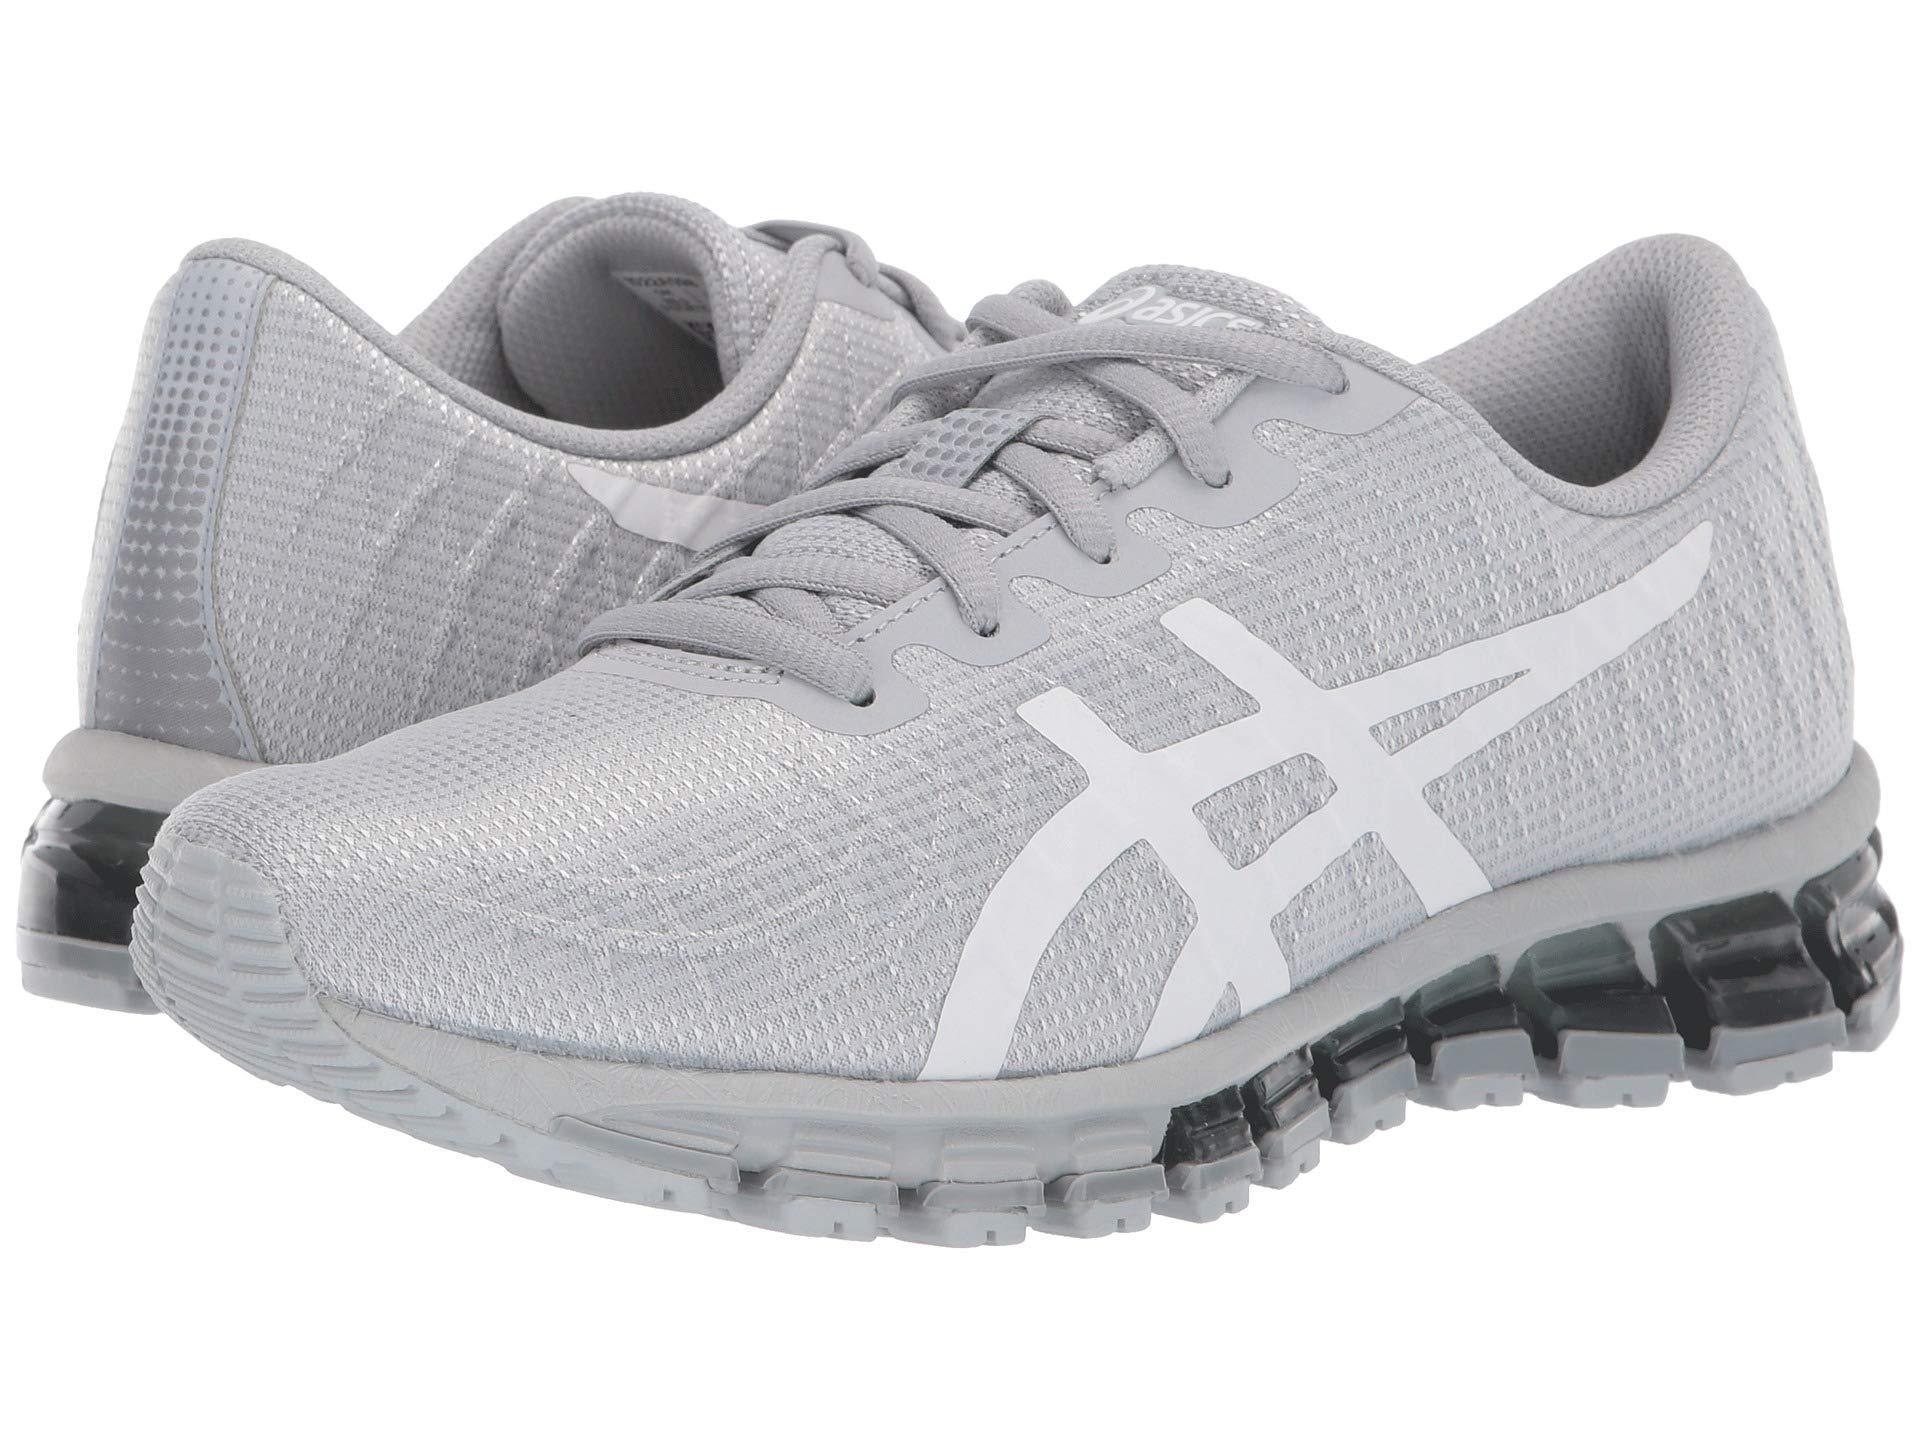 c420d6dea7e Asics. Gray Gel-quantum 180 4 (ice Mint stone Grey) Women s Running Shoes